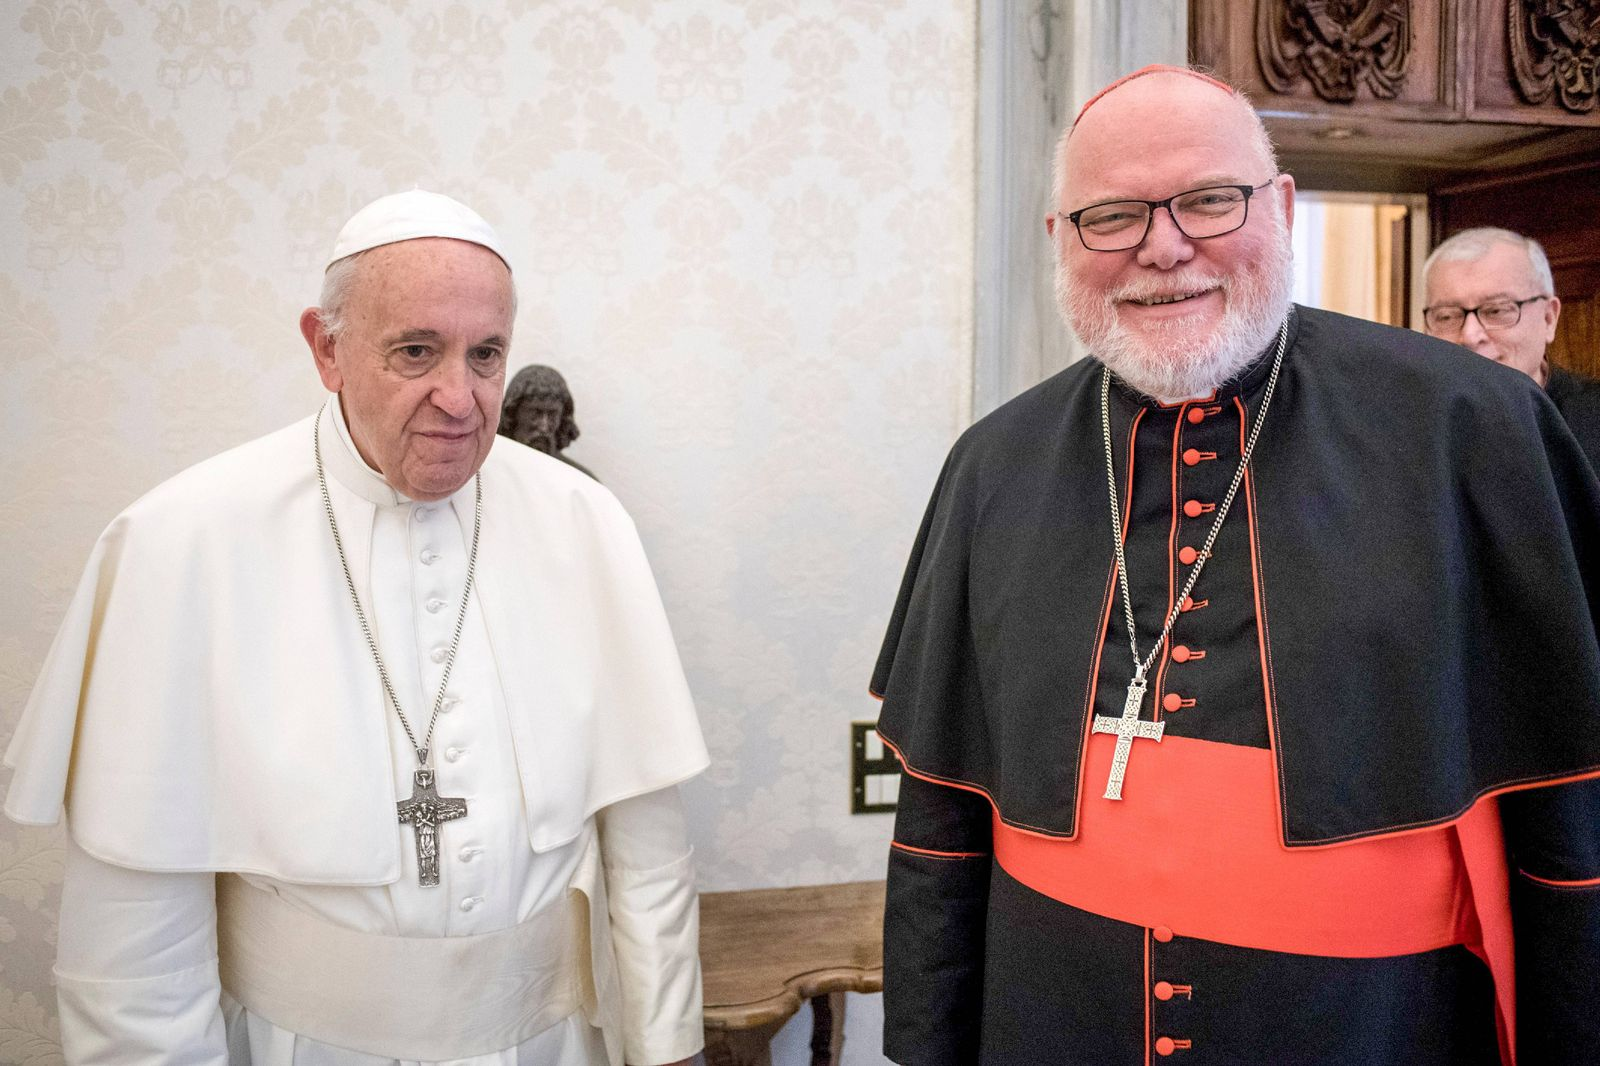 NO FRANCE - NO SWITZERLAND: May 27, 2019 : Pope Francis meets Card. Reinhard Marx, Archbishop of München und Freising (